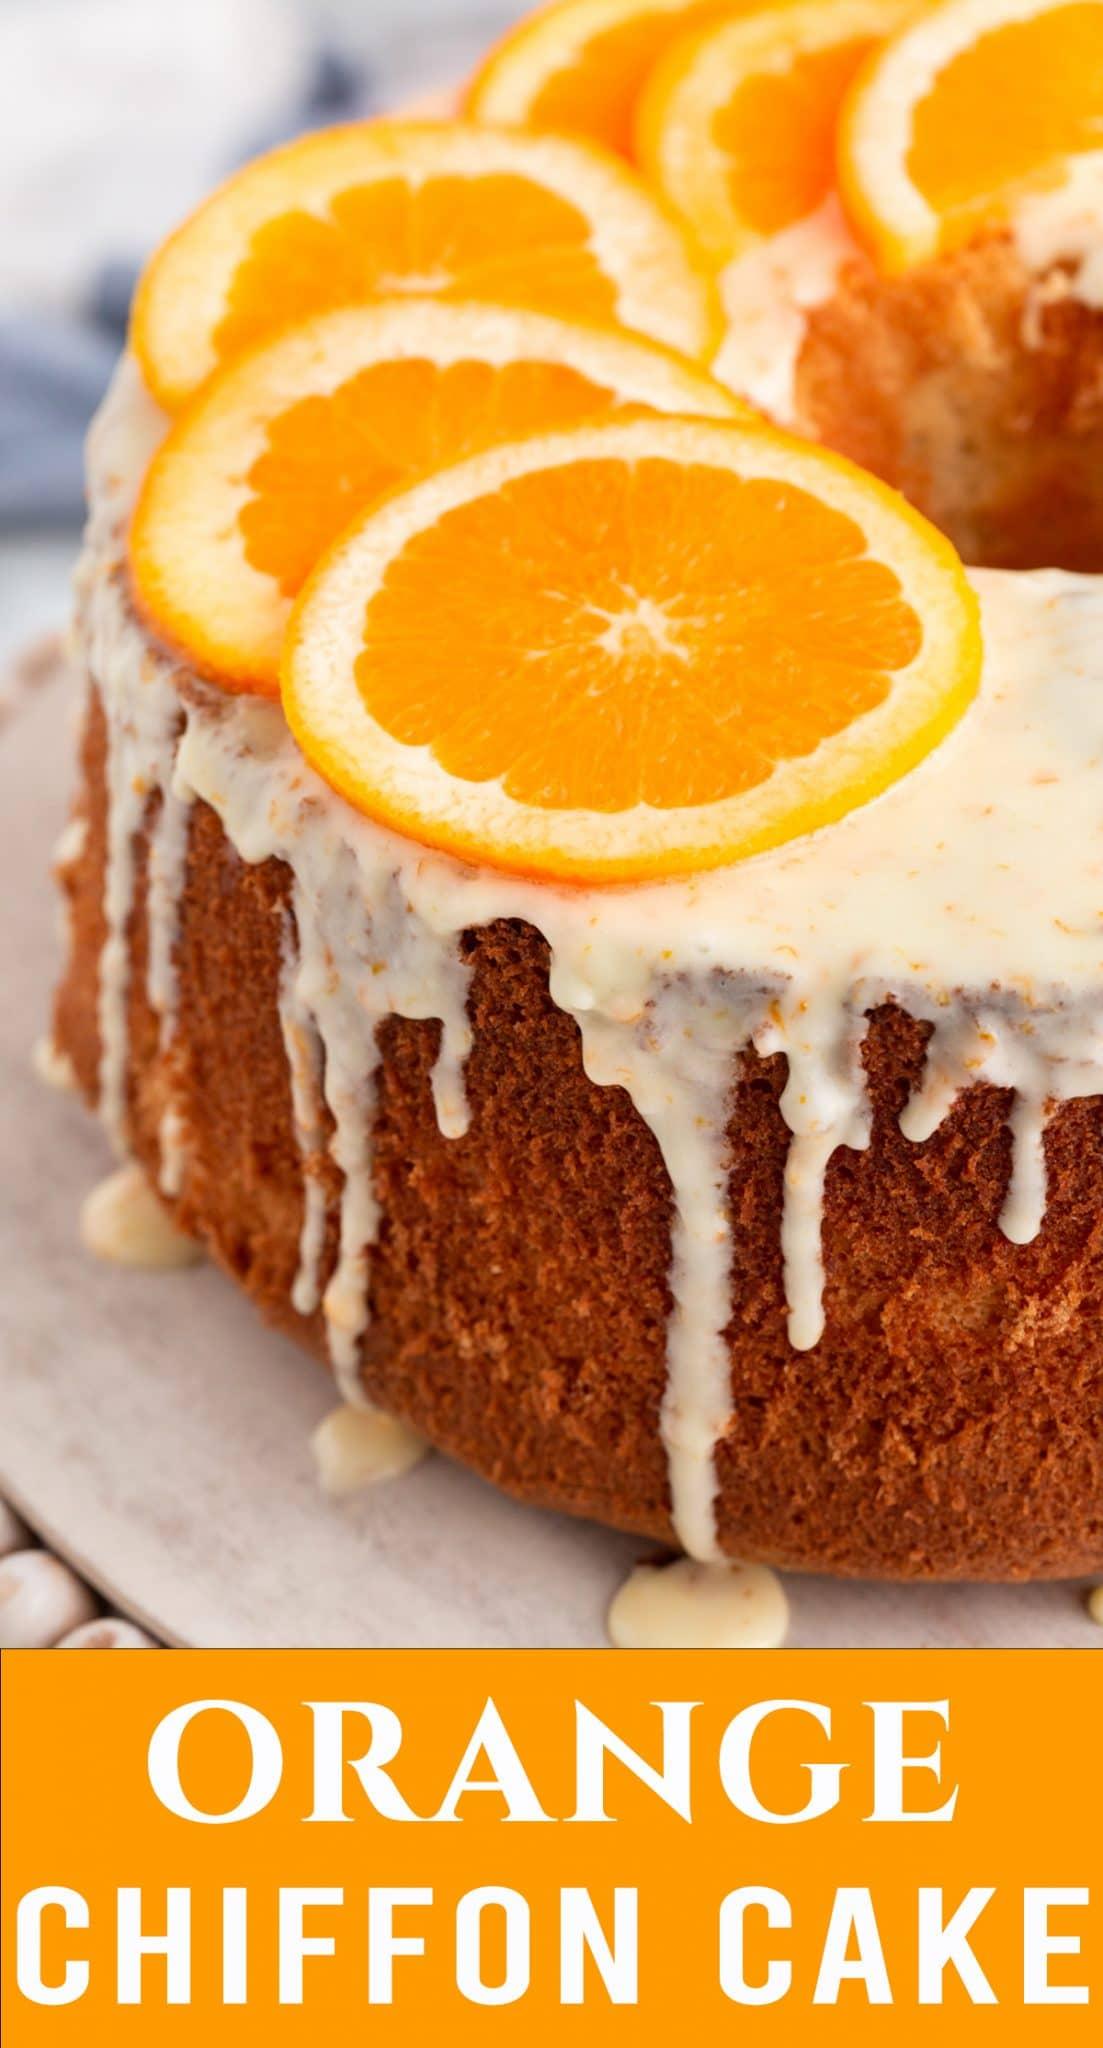 Light, fluffy, orange chiffon cake made with fresh oranges. Make a simple powdered sugar glaze to top the cake for a simply gorgeous dessert recipe. via @thebestcakerecipes